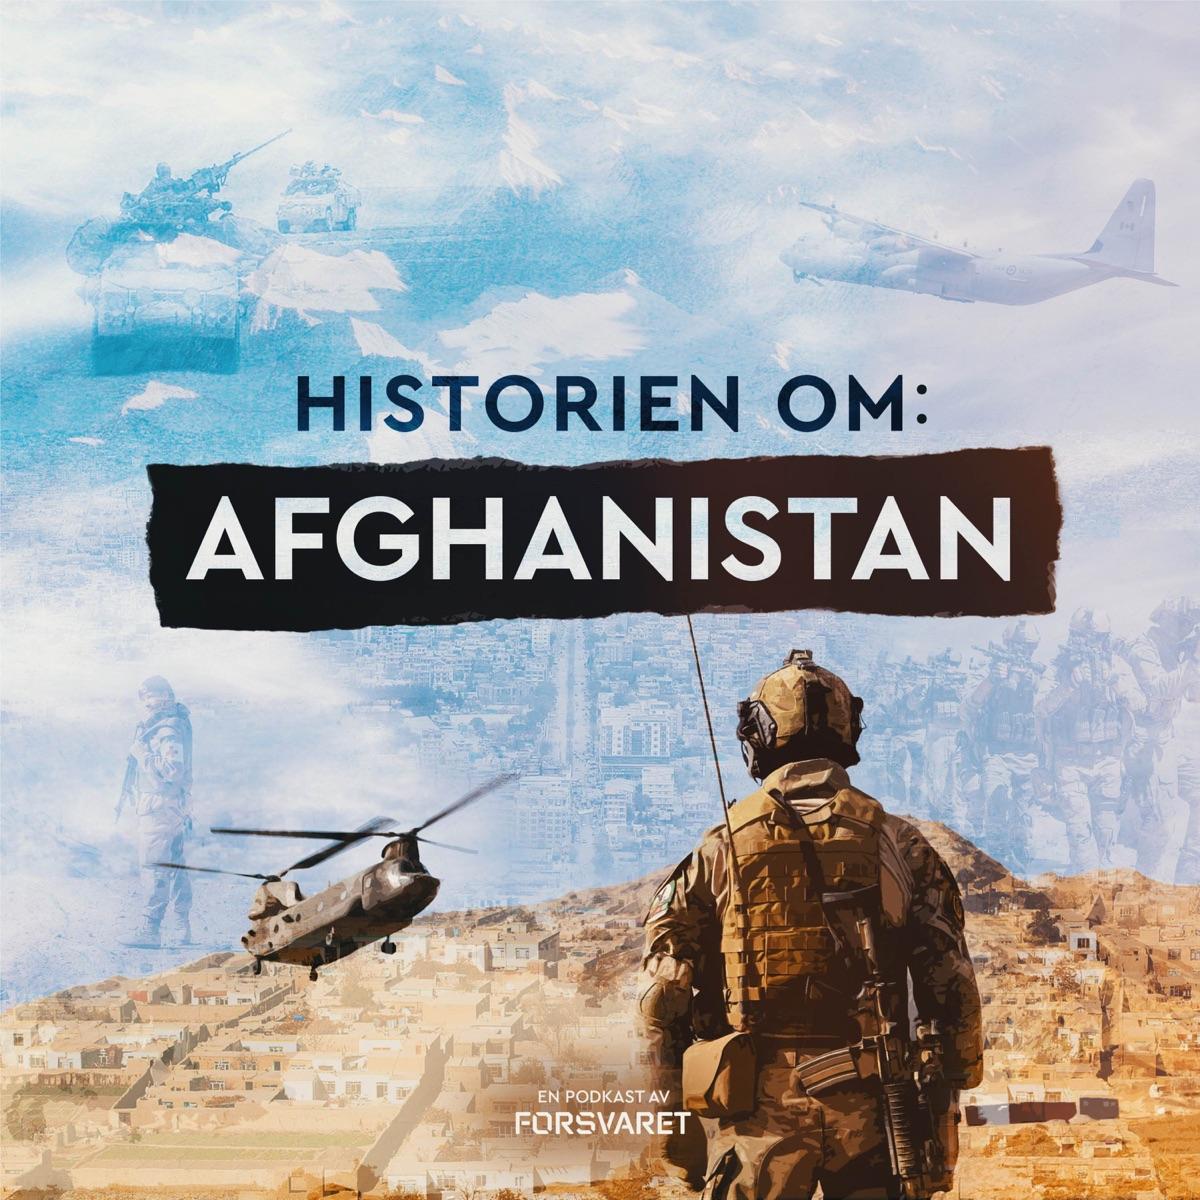 Historien om: Afghanistan